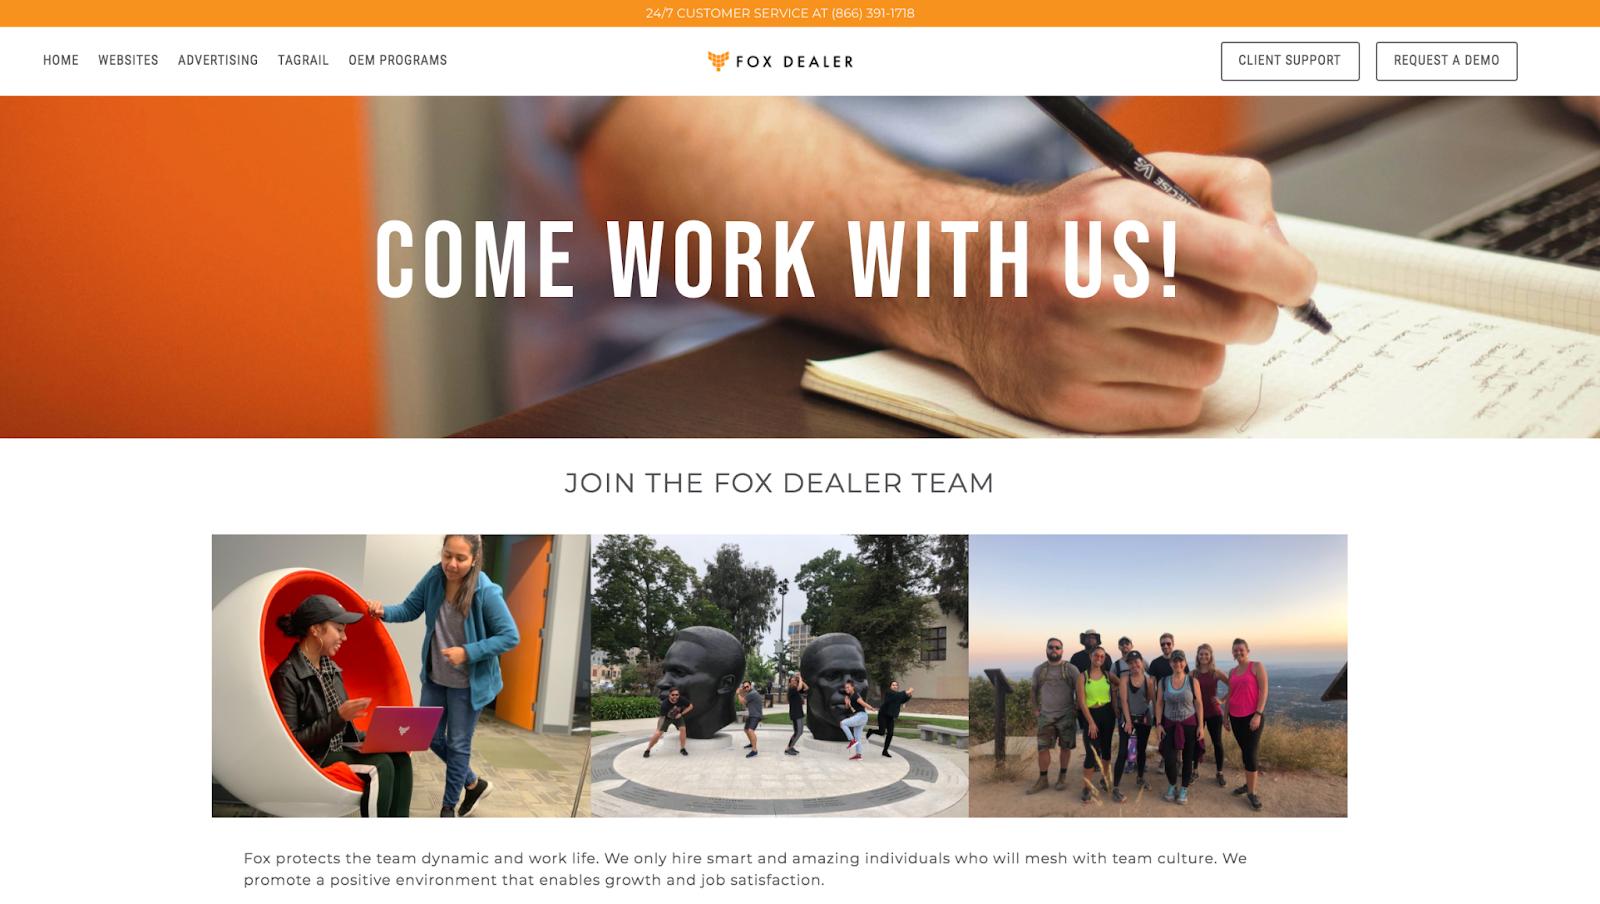 Fox Dealer Career Page